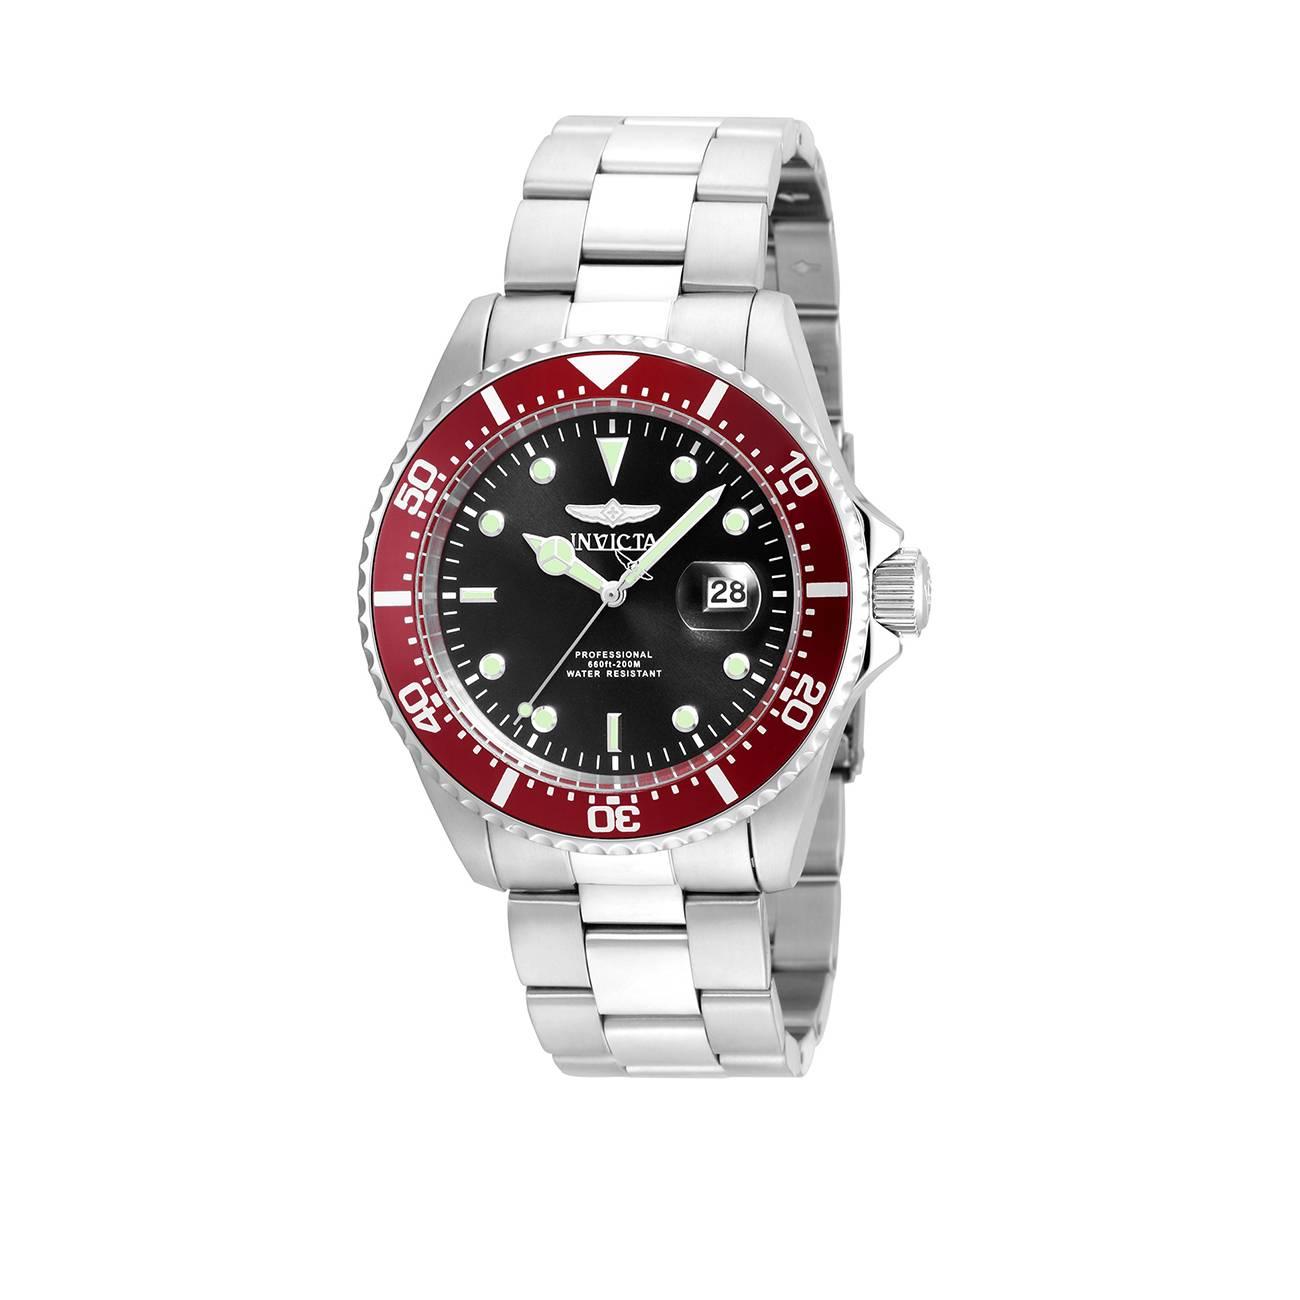 Pro Diver 22020 imagine